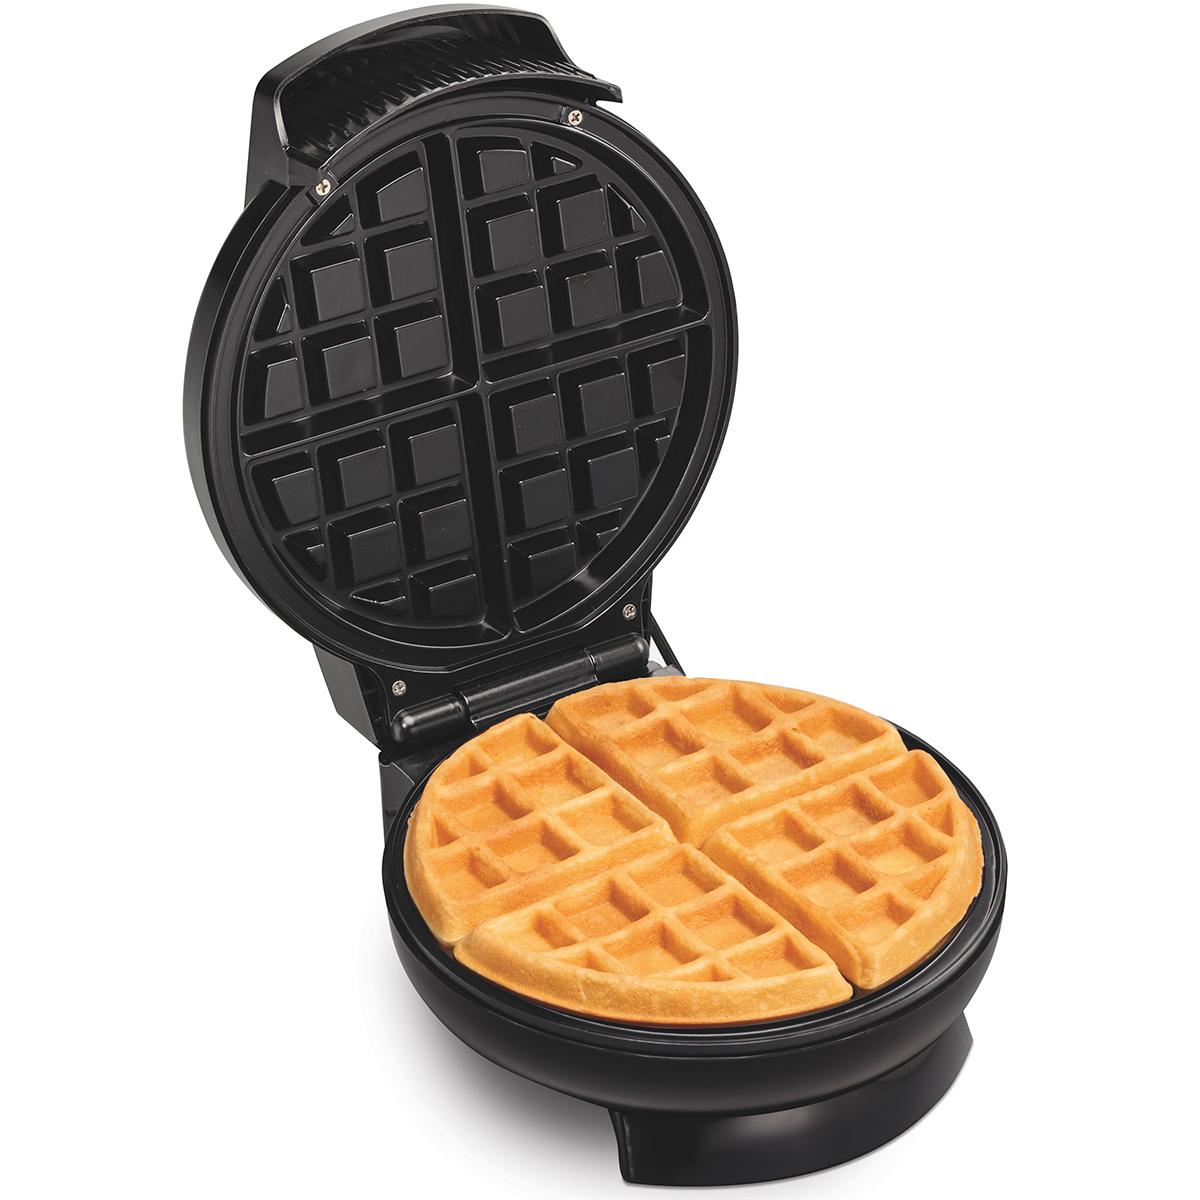 Hamilton Beach 26071 Belgian-Style Round Waffle Maker - CBS BAHAMAS LTD